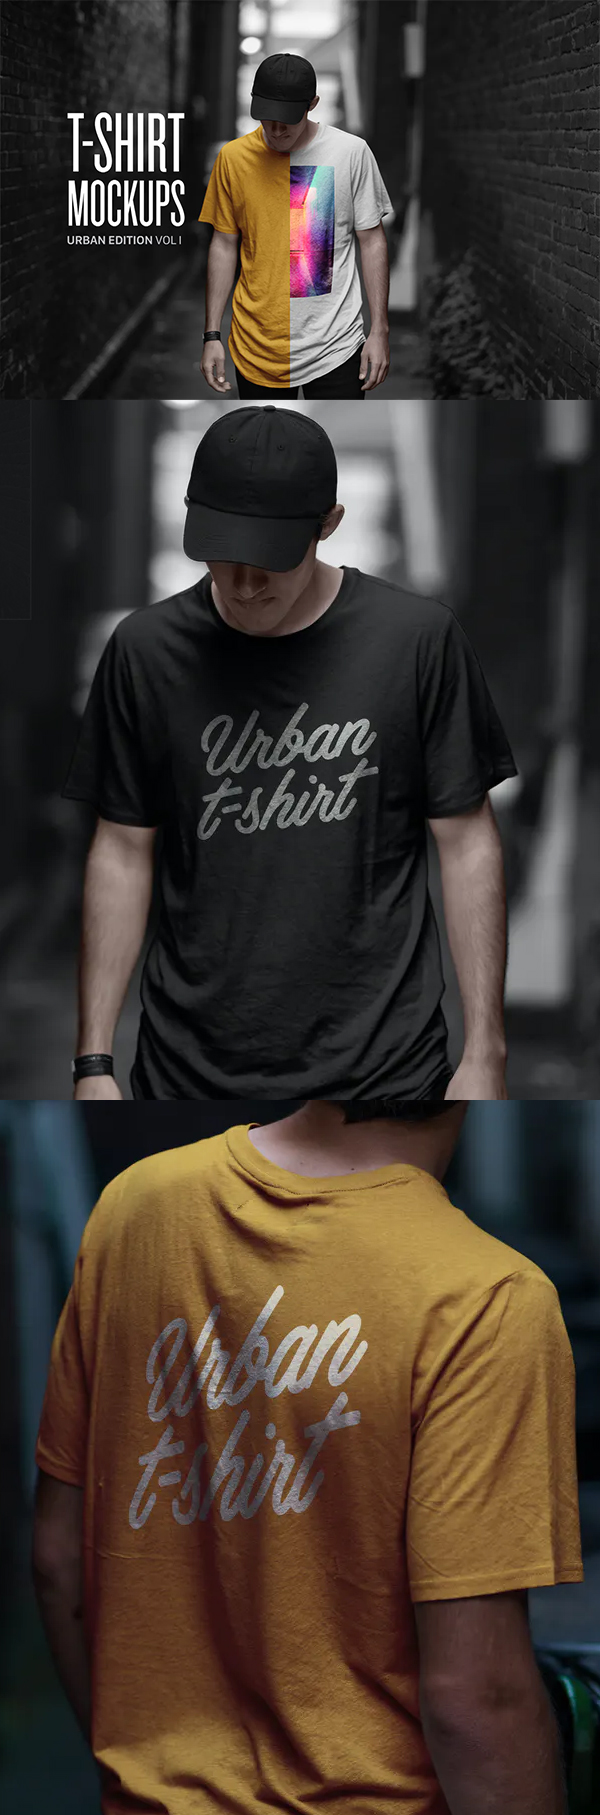 Creative T-Shirt Mockup